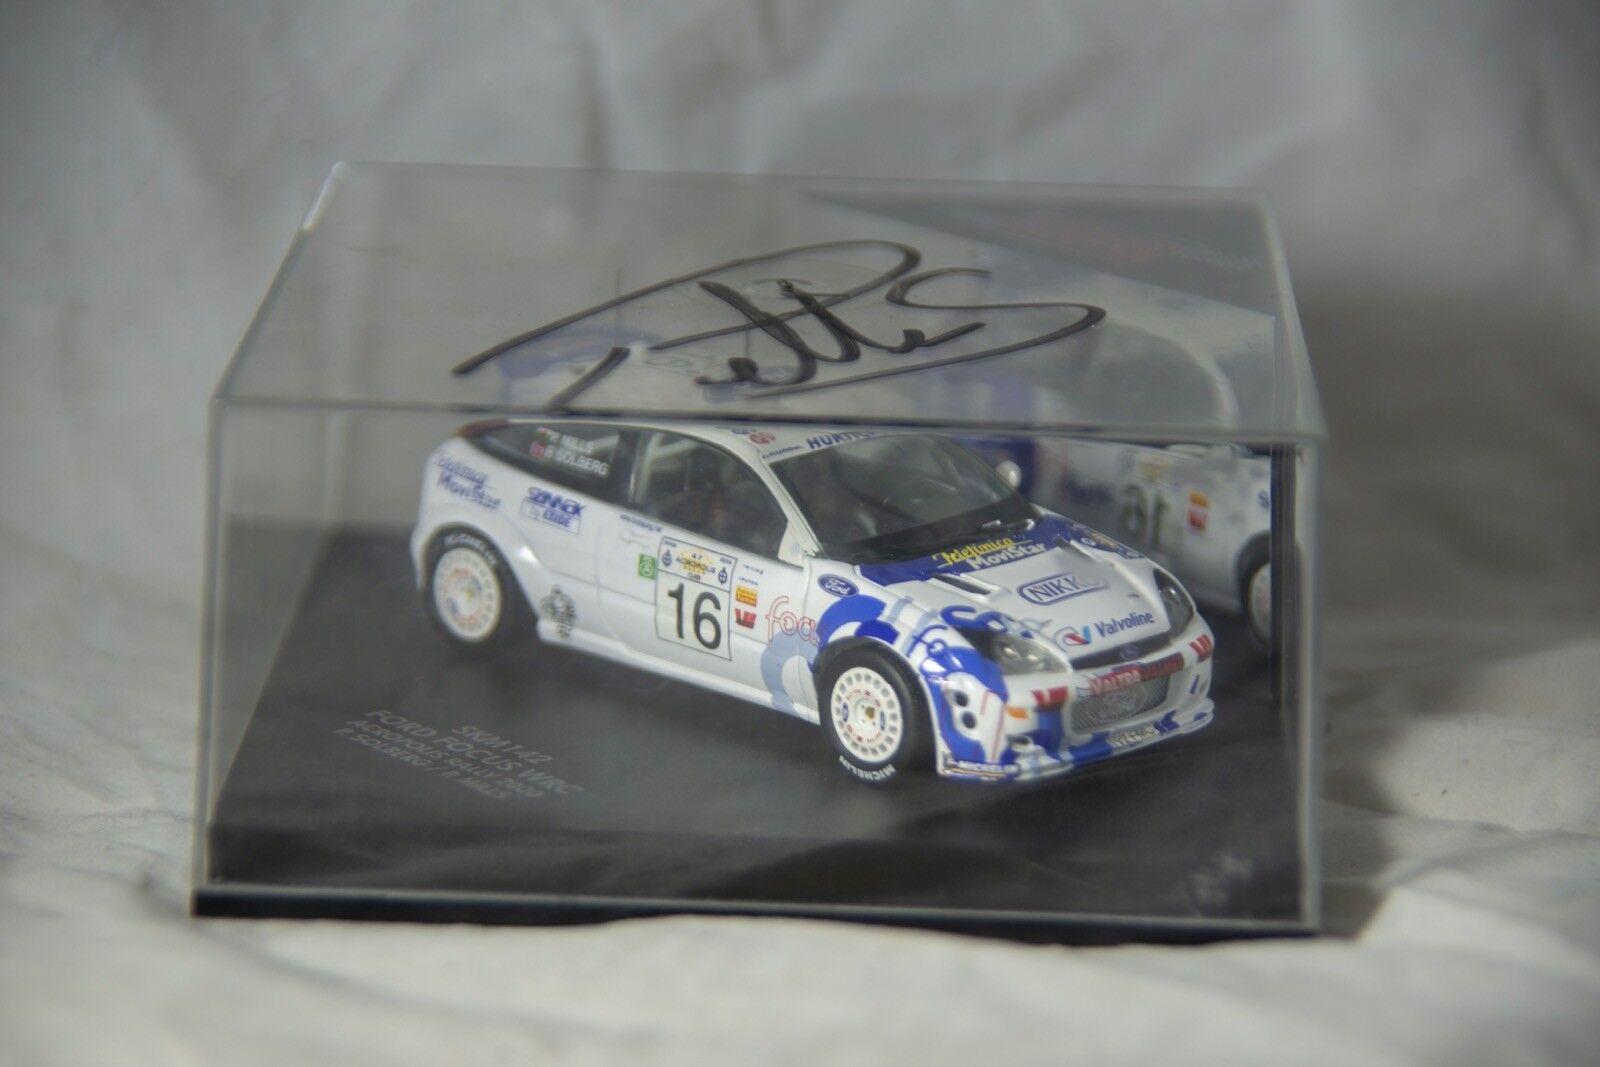 Skid SKM143 1 43 Ford Focus WRC Acropolis Rally 2000 Petter Solberg Philip Mills